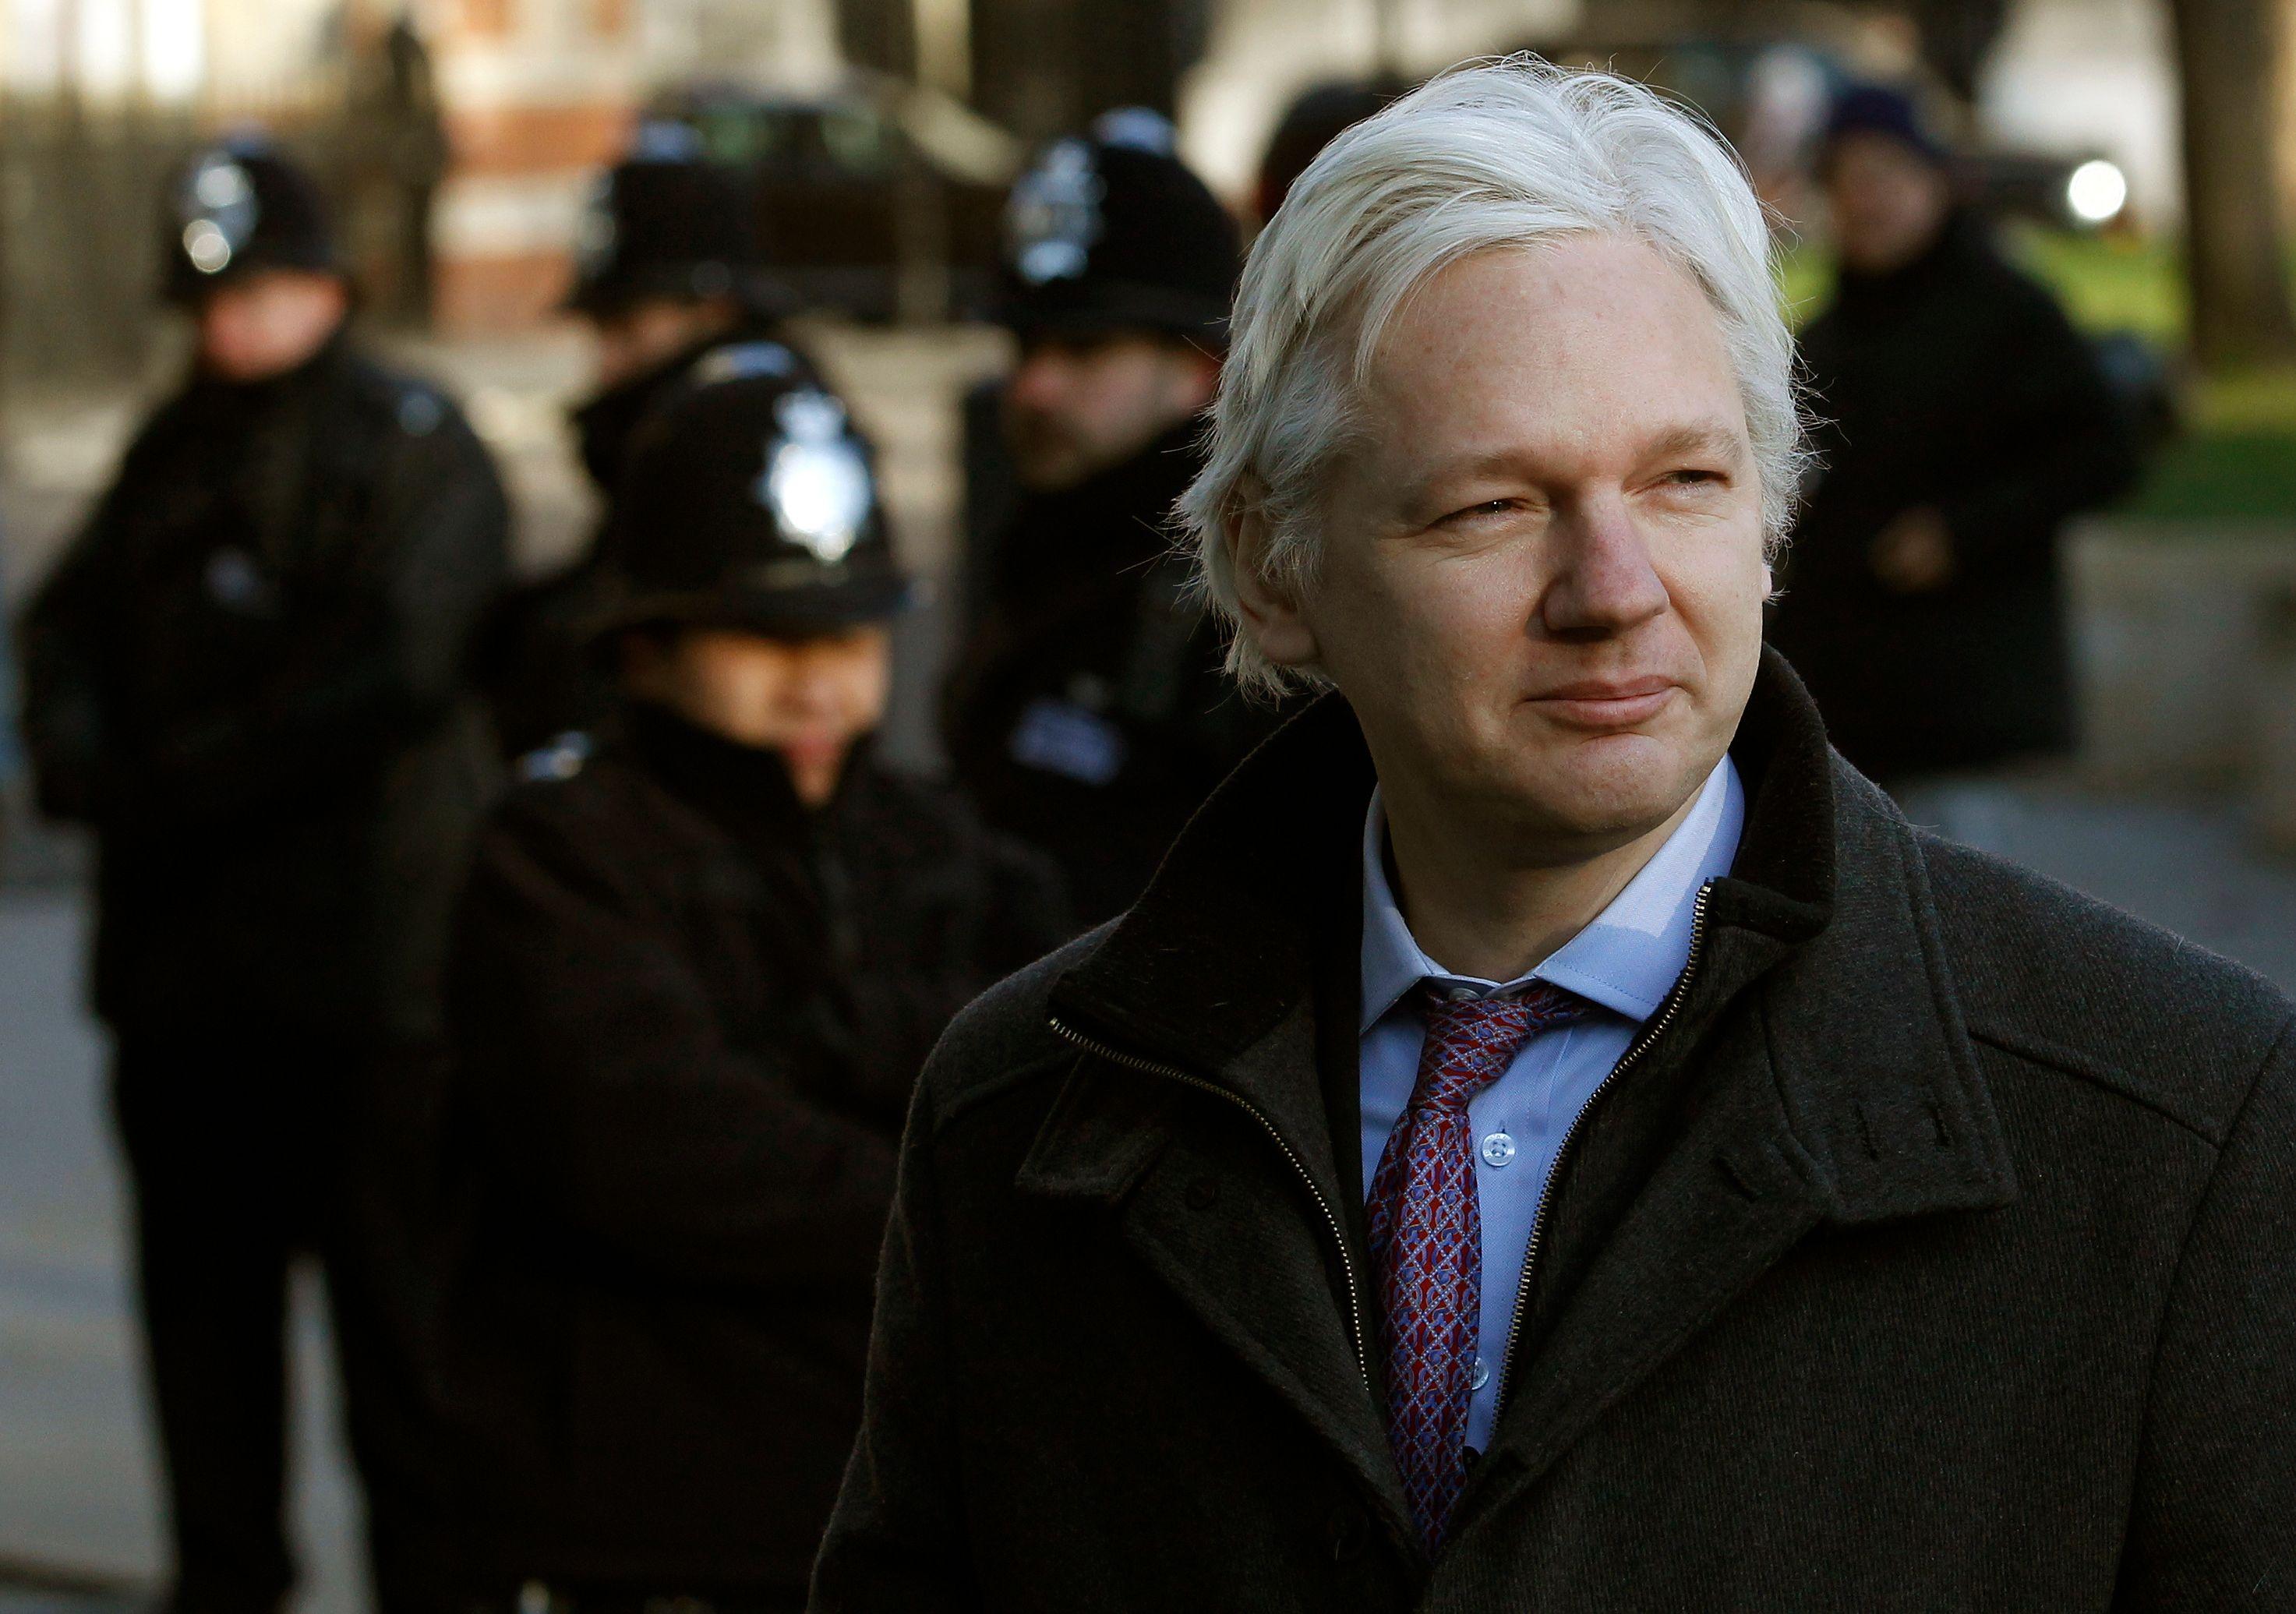 Wikileaks : Julian Assange se rendra en cas d'arbitrage défavorable